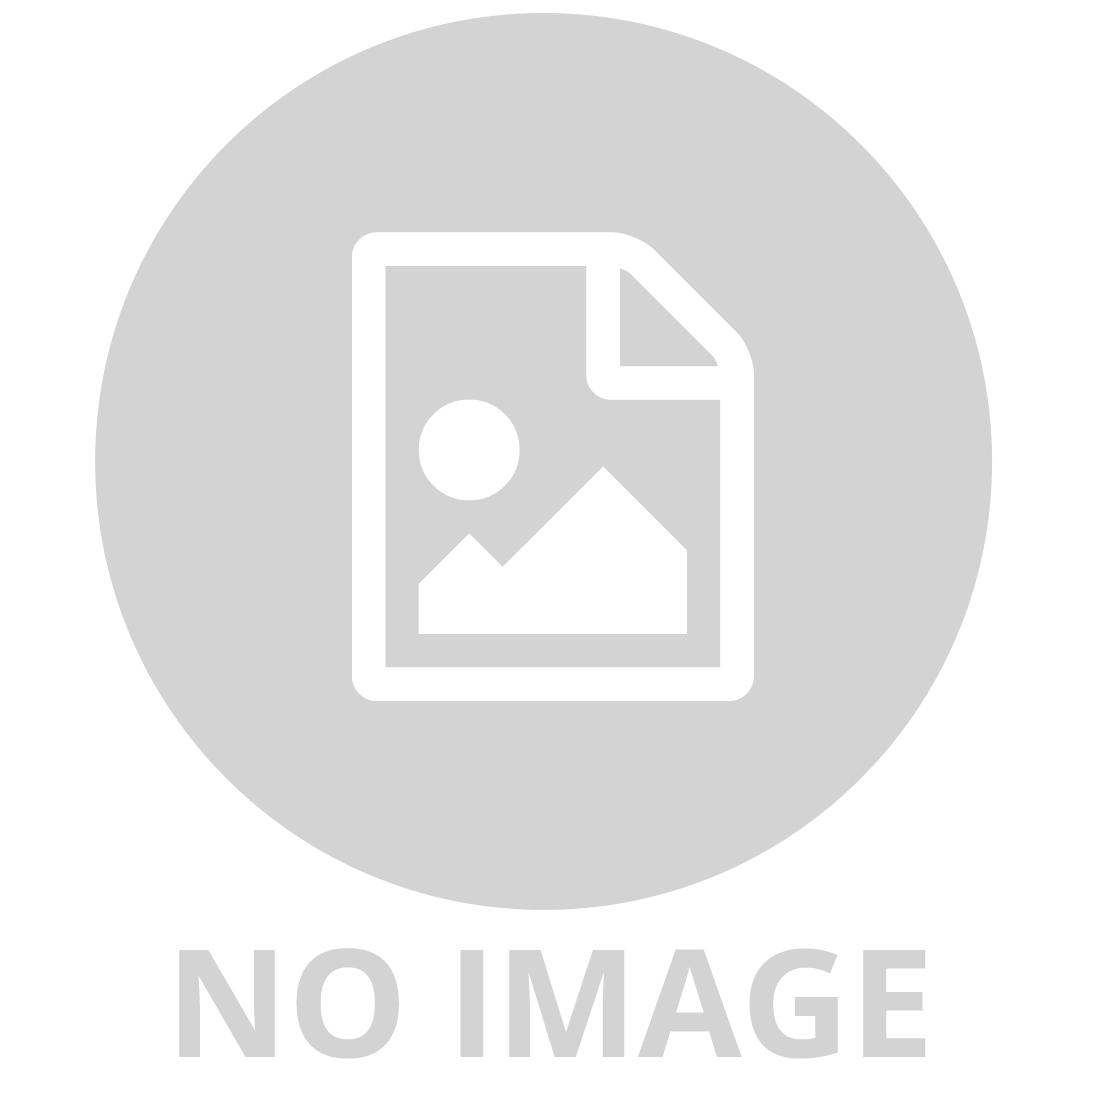 TAMIYA ACRYLIC X-4 BLUE GLOSS